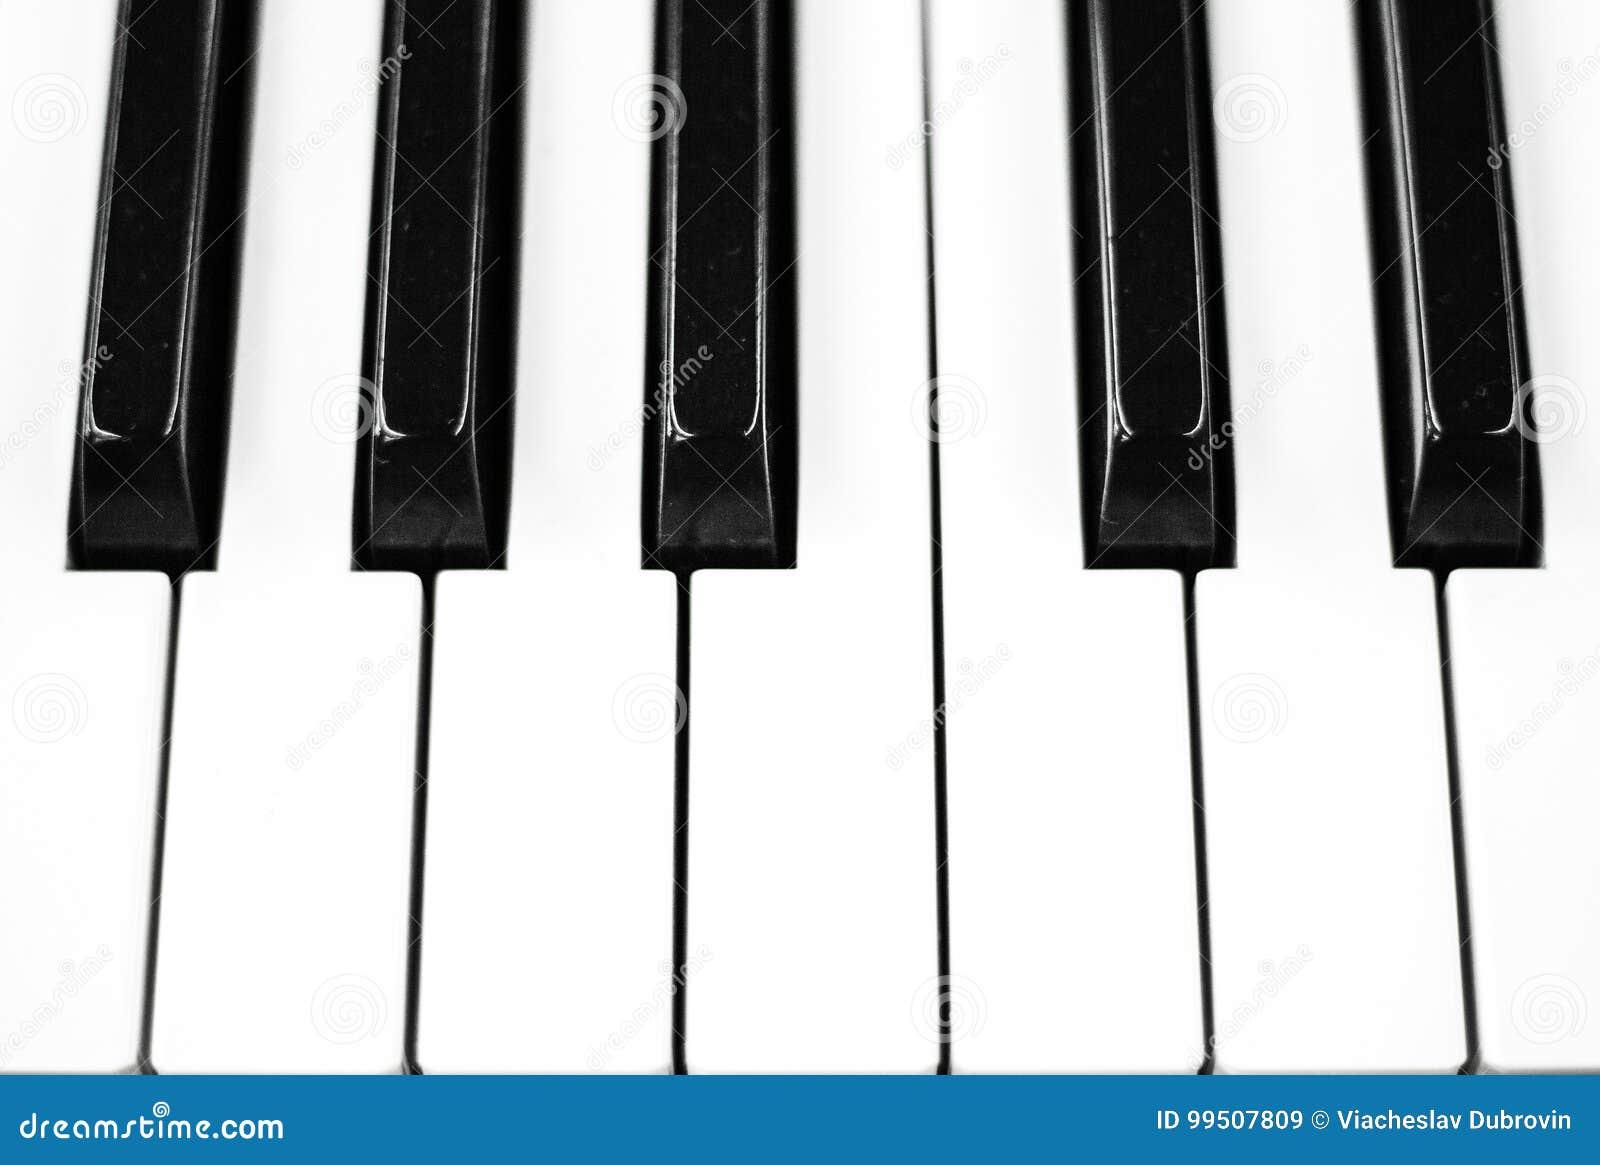 Piano Keys Closeup Photo Black And White Keyboard Of Musical Instrument